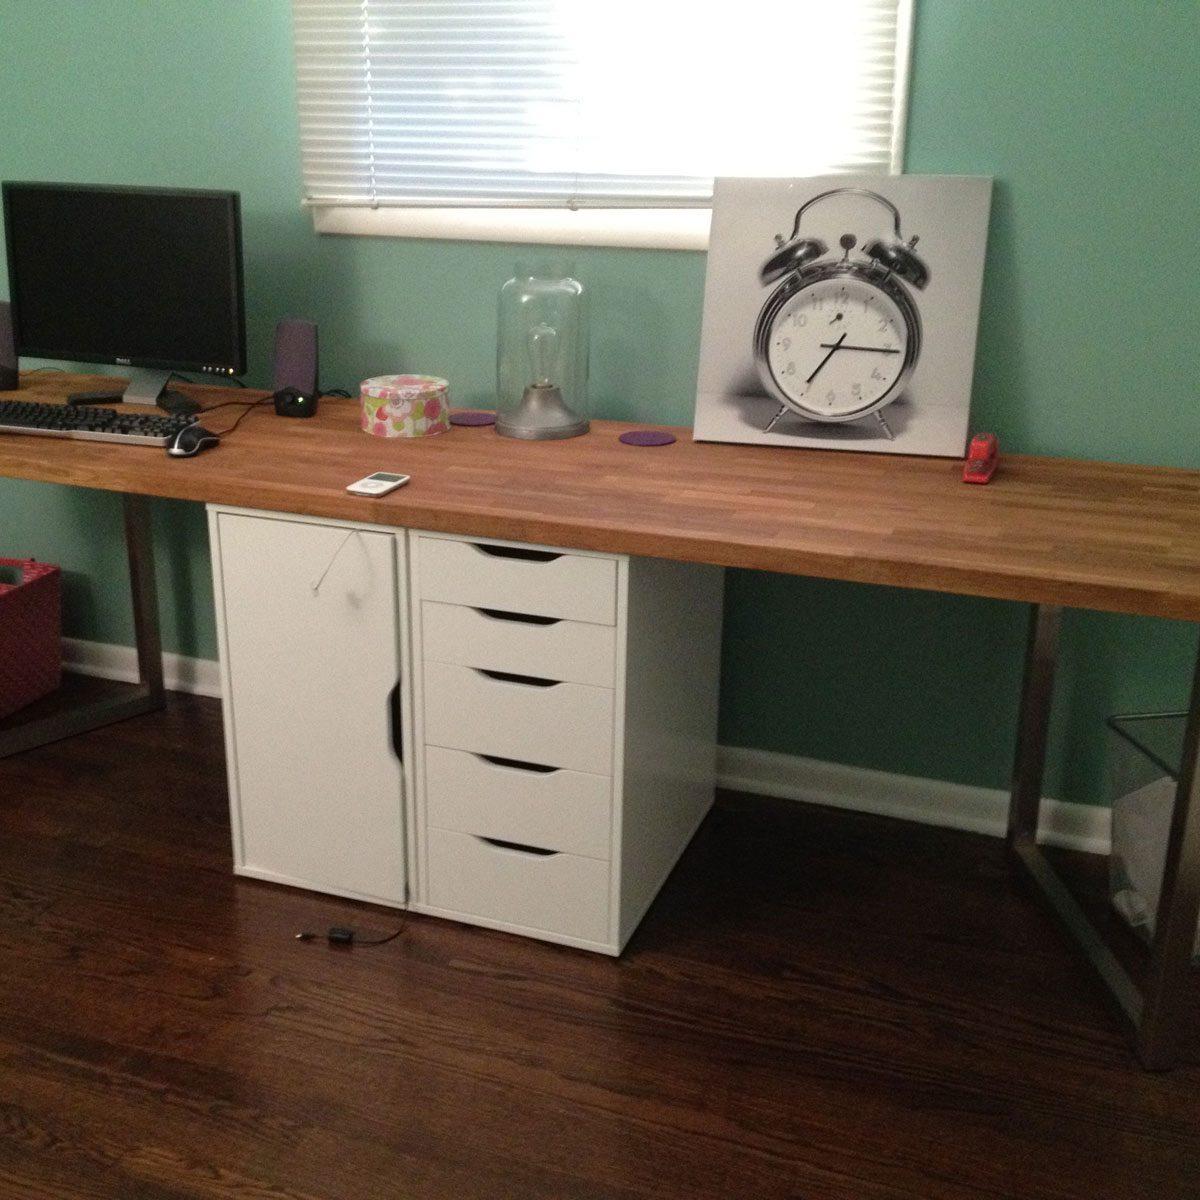 12 incredible ikea hacks the family handyman. Black Bedroom Furniture Sets. Home Design Ideas